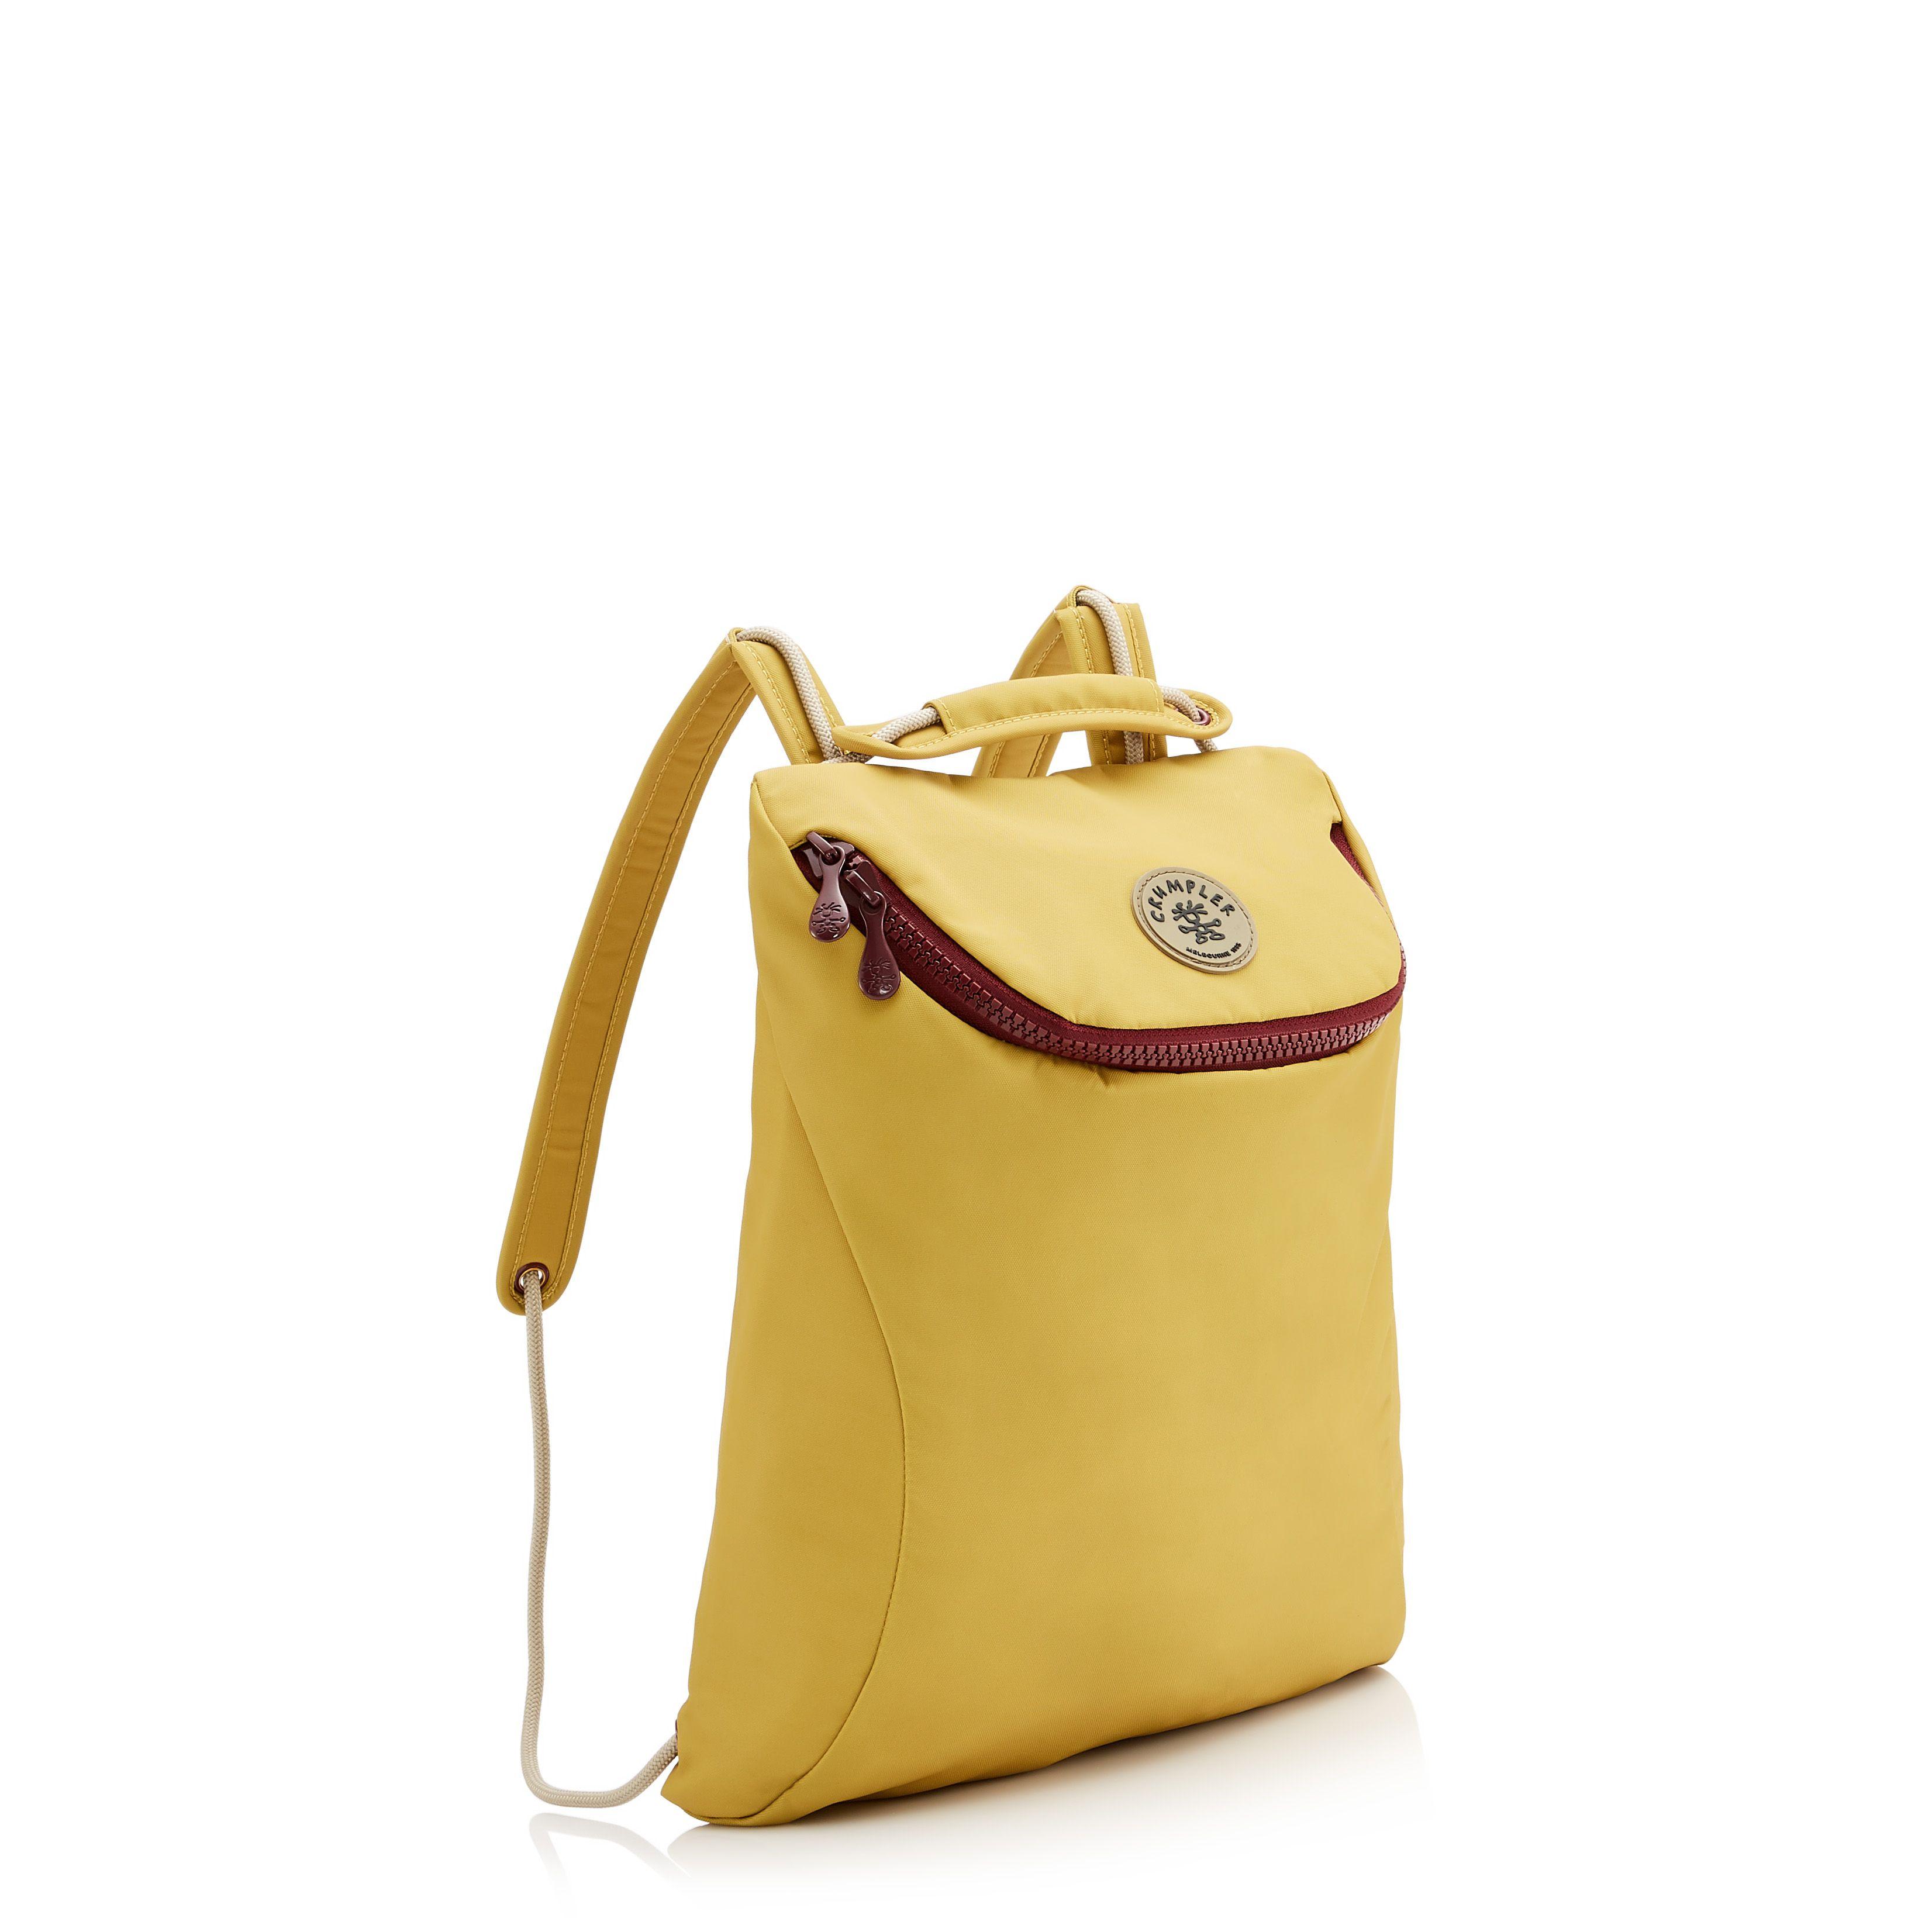 4d3b49b4fa The Fang backpack in Citron  backpacks  backpack  yellowbags   yellowbackpacks  mustardbags  mustardbackpacks  versatilebags   weatherproofbags  crumpler